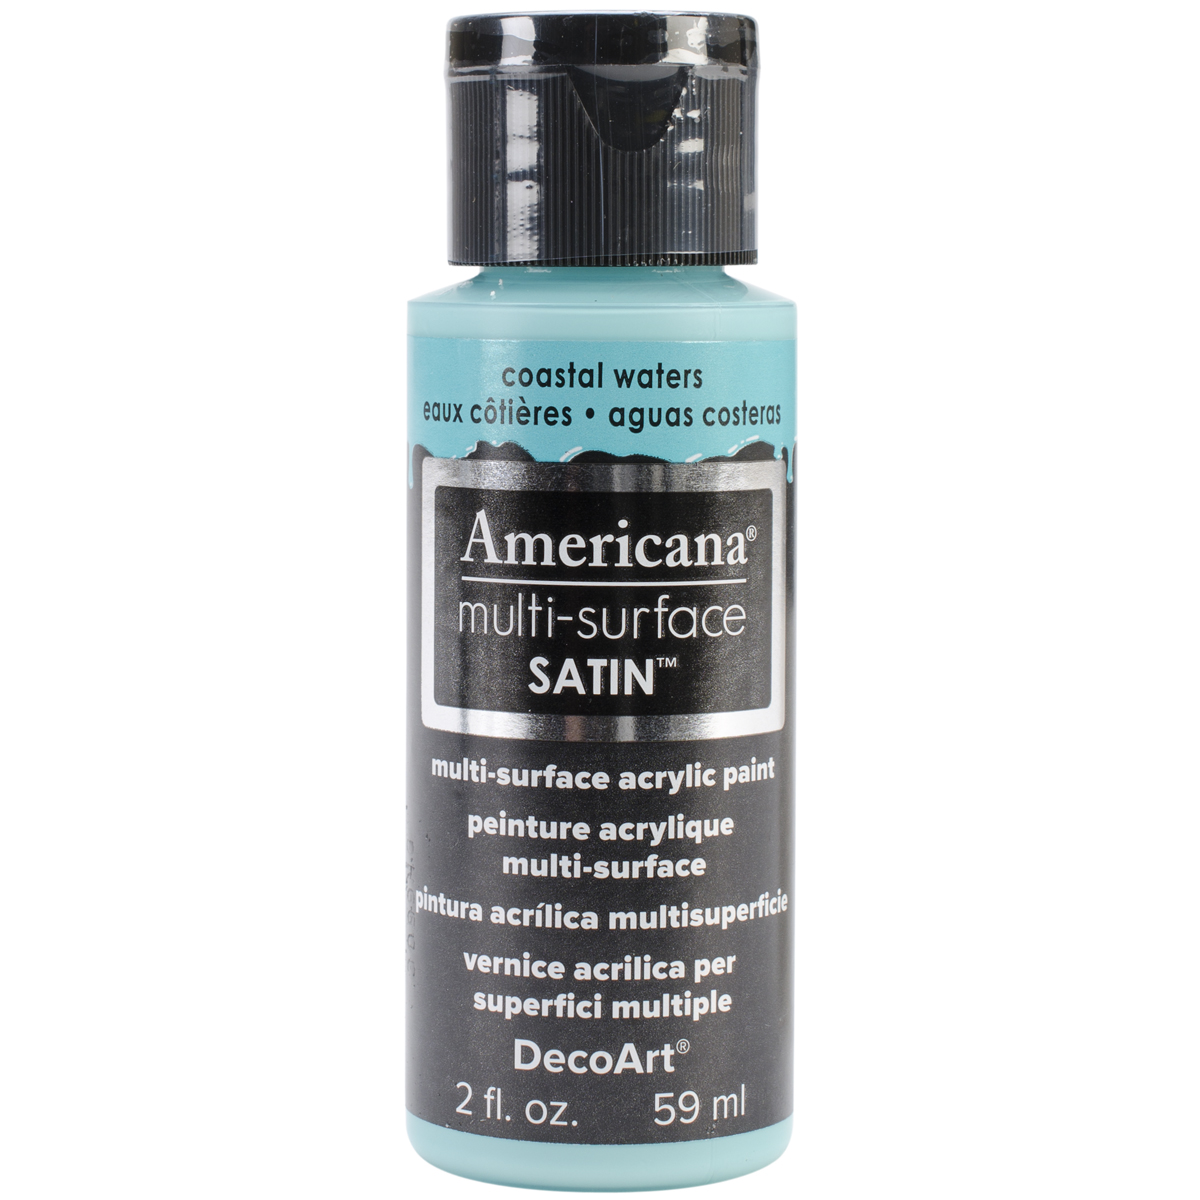 Americana Multi-Surface Satin Acrylic Paint 2oz-Coastal Waters